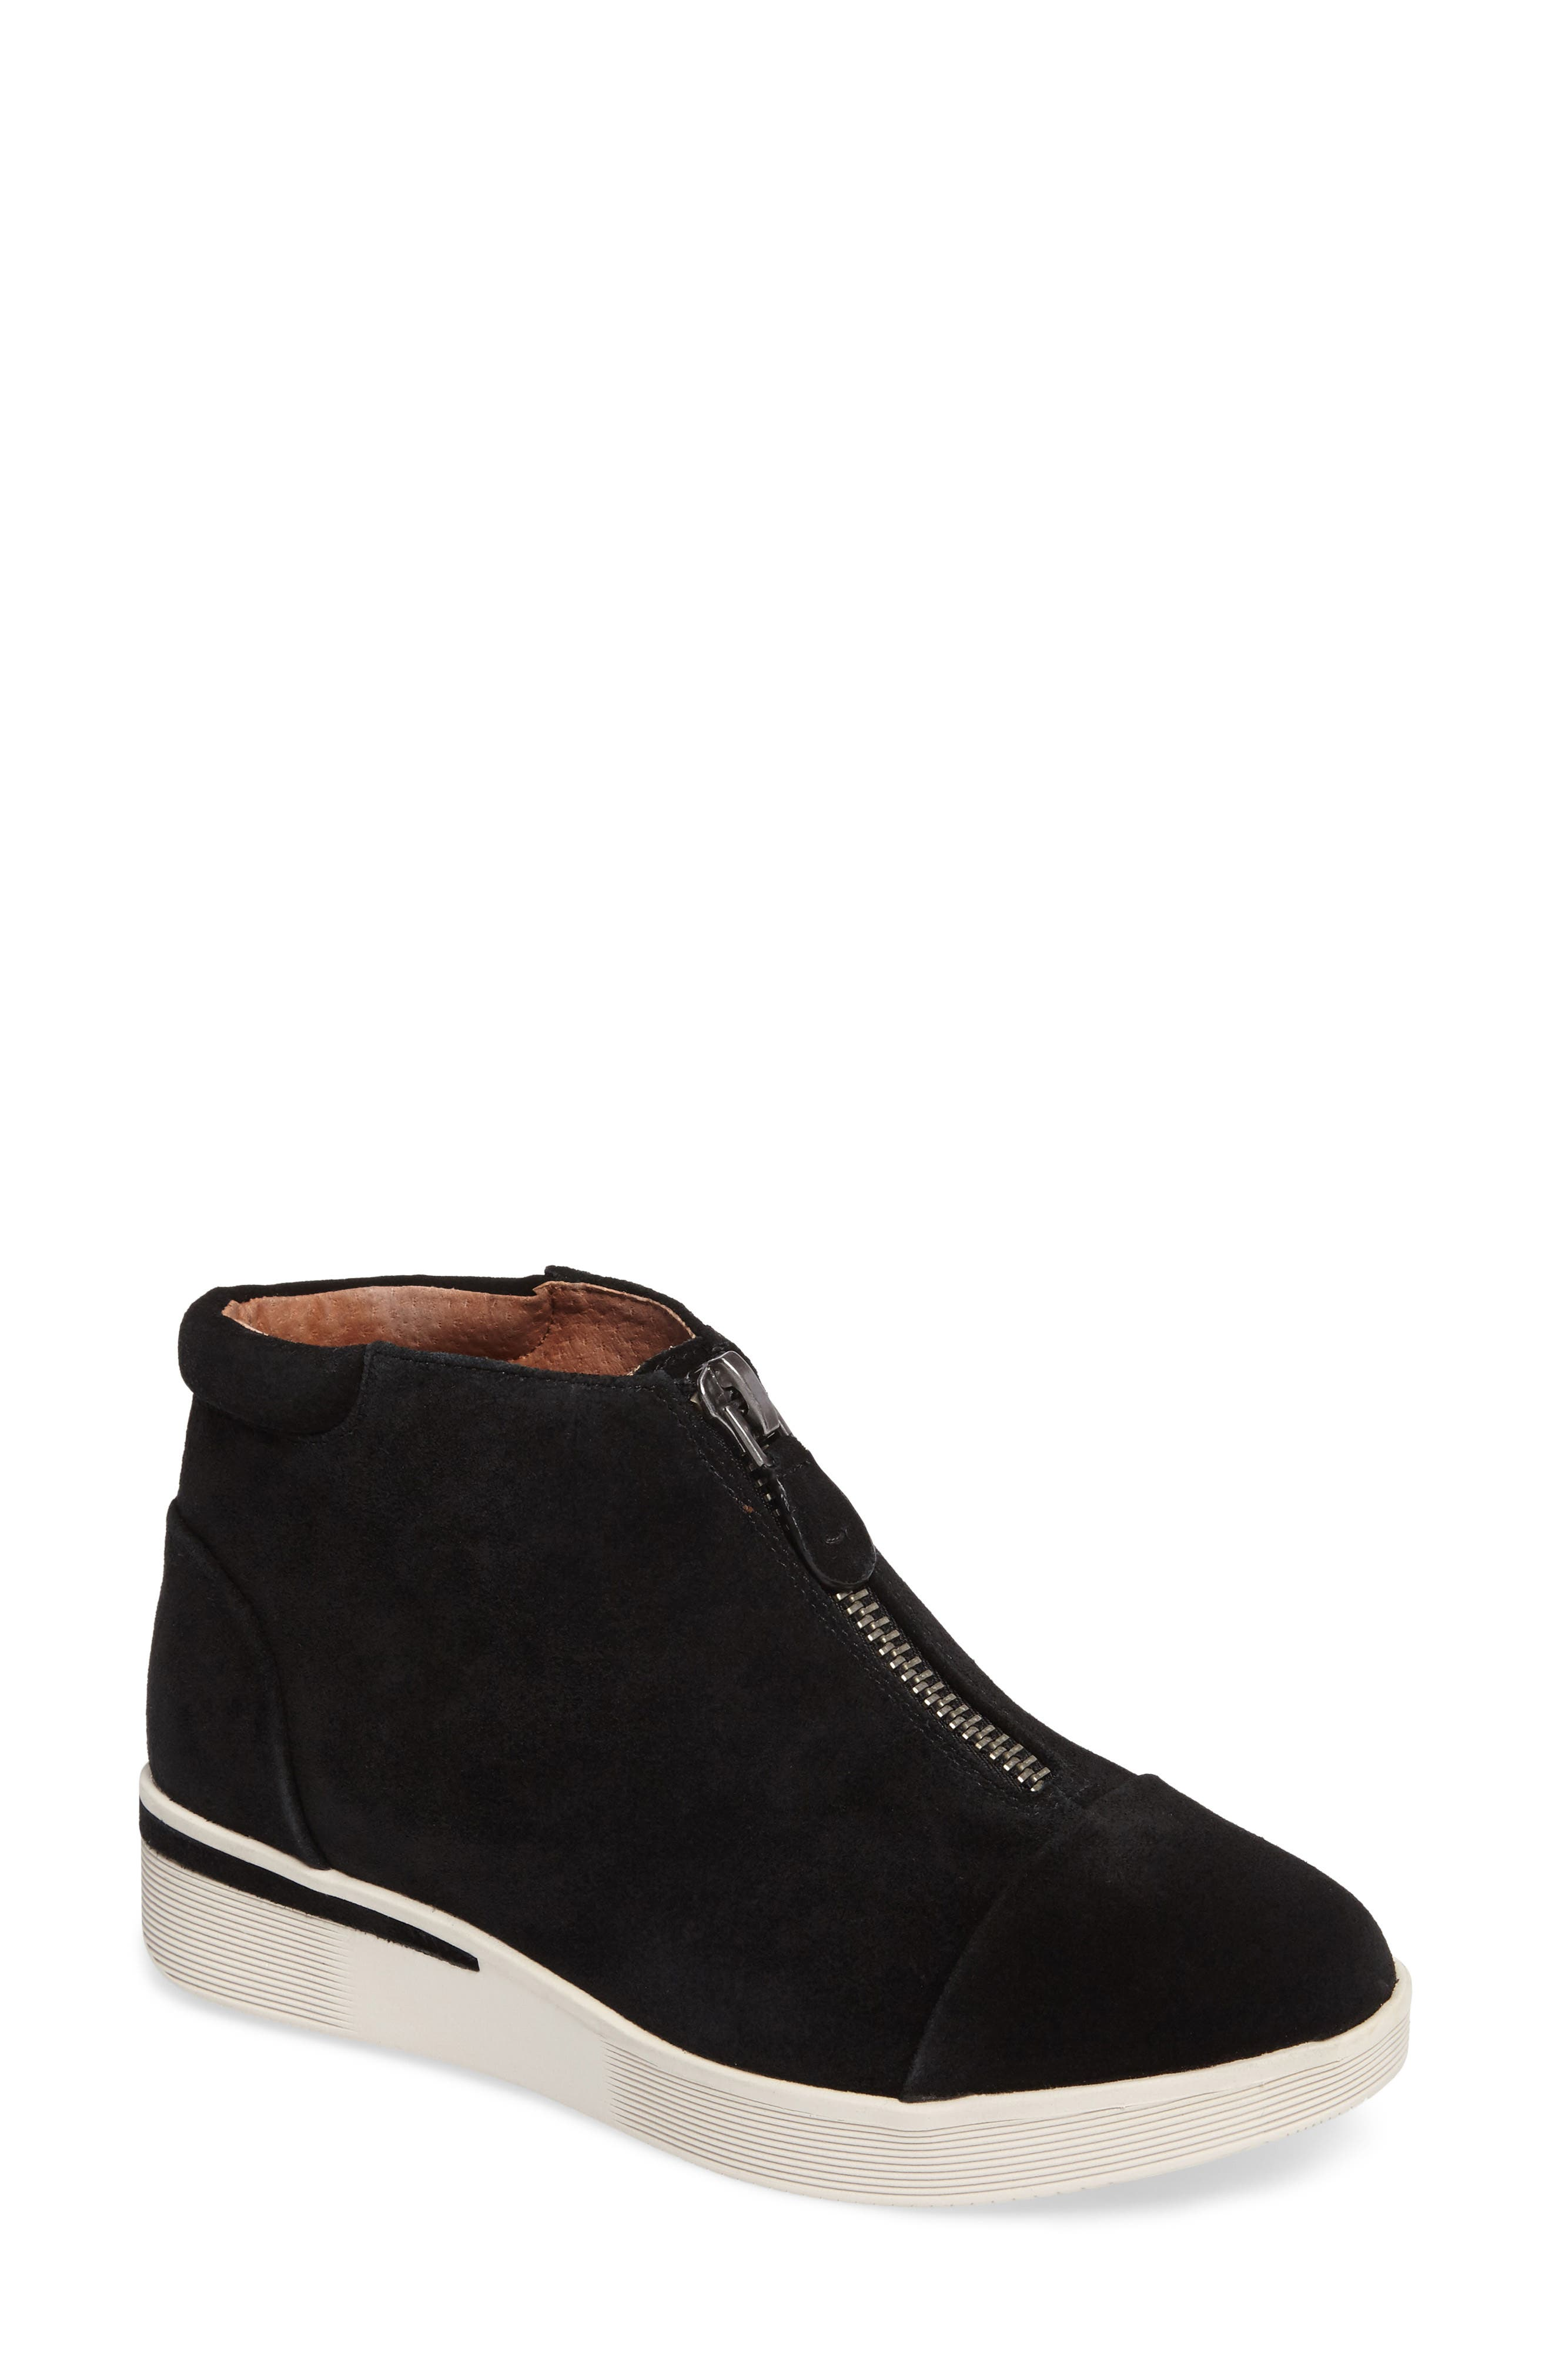 GENTLE SOULS BY KENNETH COLE Hazel Fay High Top Sneaker, Main, color, BLACK SUEDE